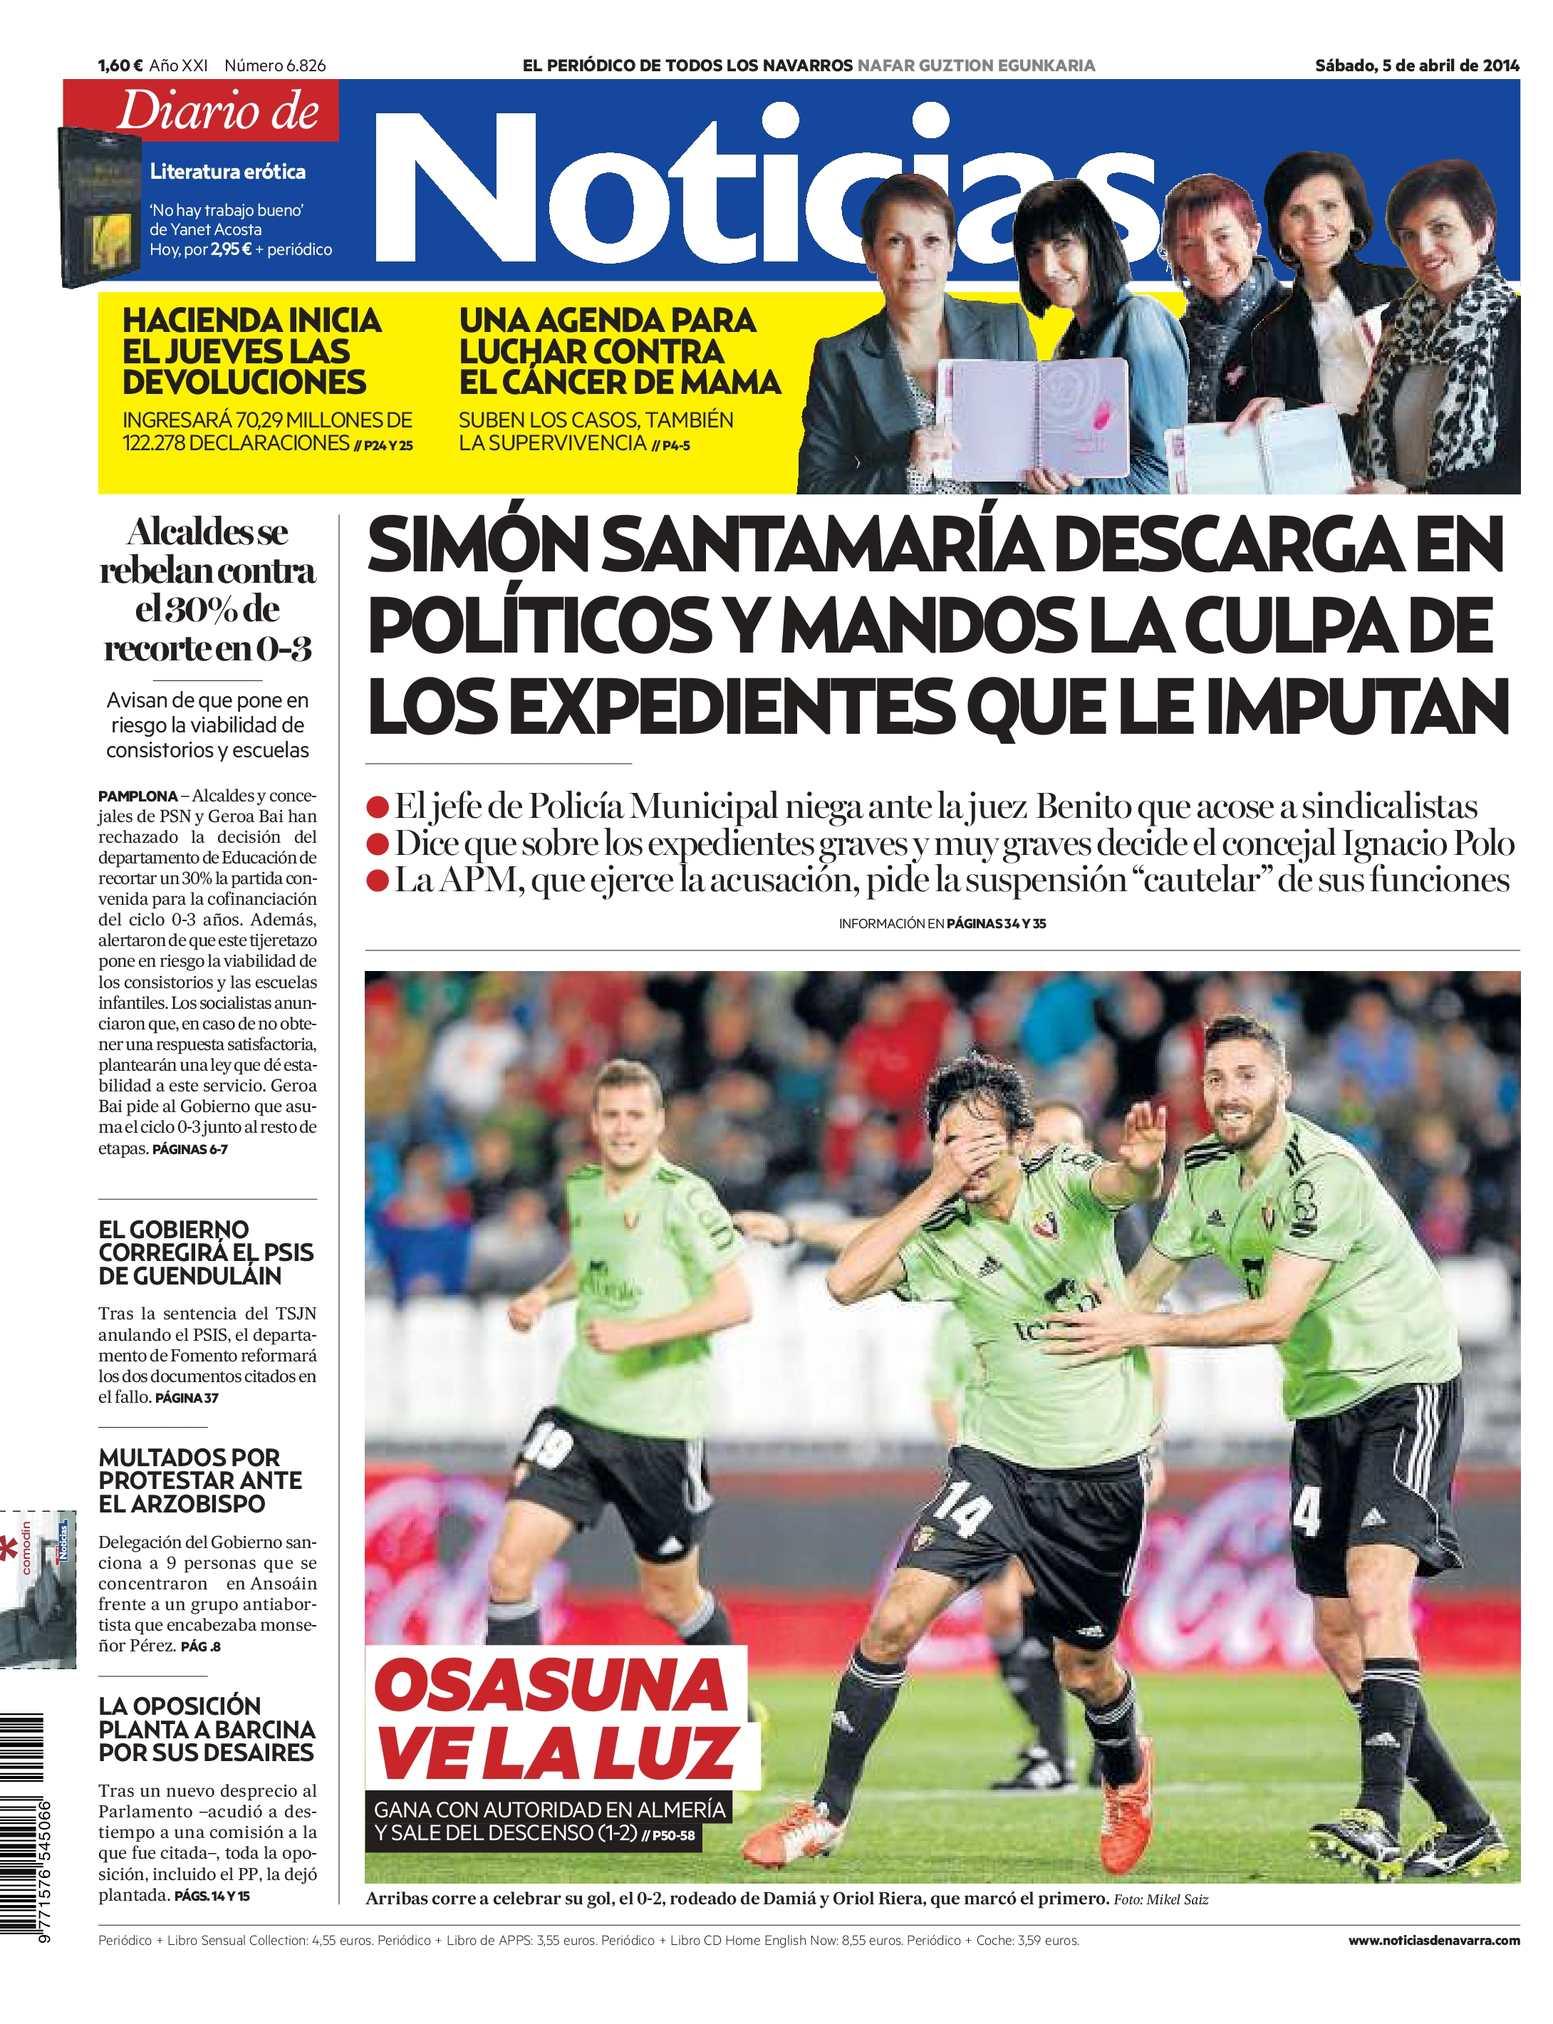 Calaméo - Diario de Noticias 20140405 3eb894c9c7274